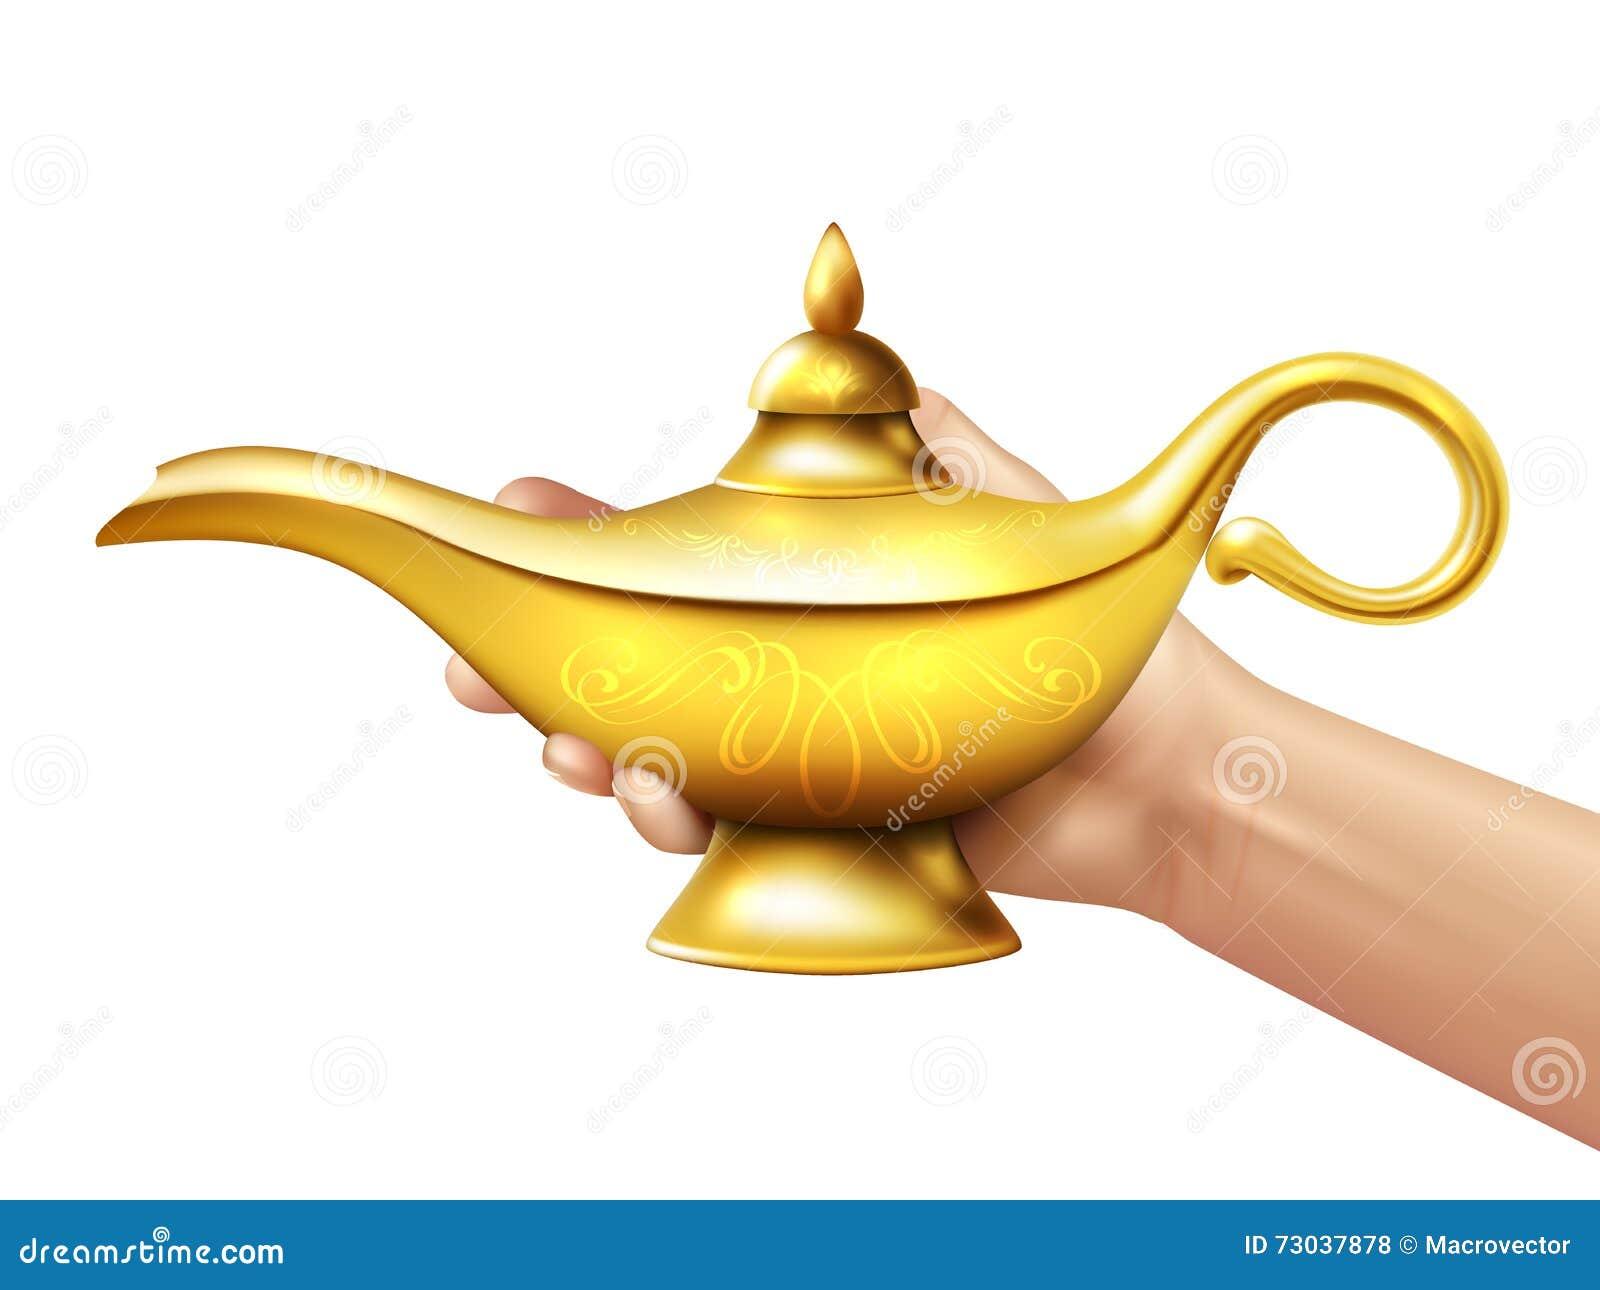 Aladdin Lamp And Hand Illustration Stock Vector ...